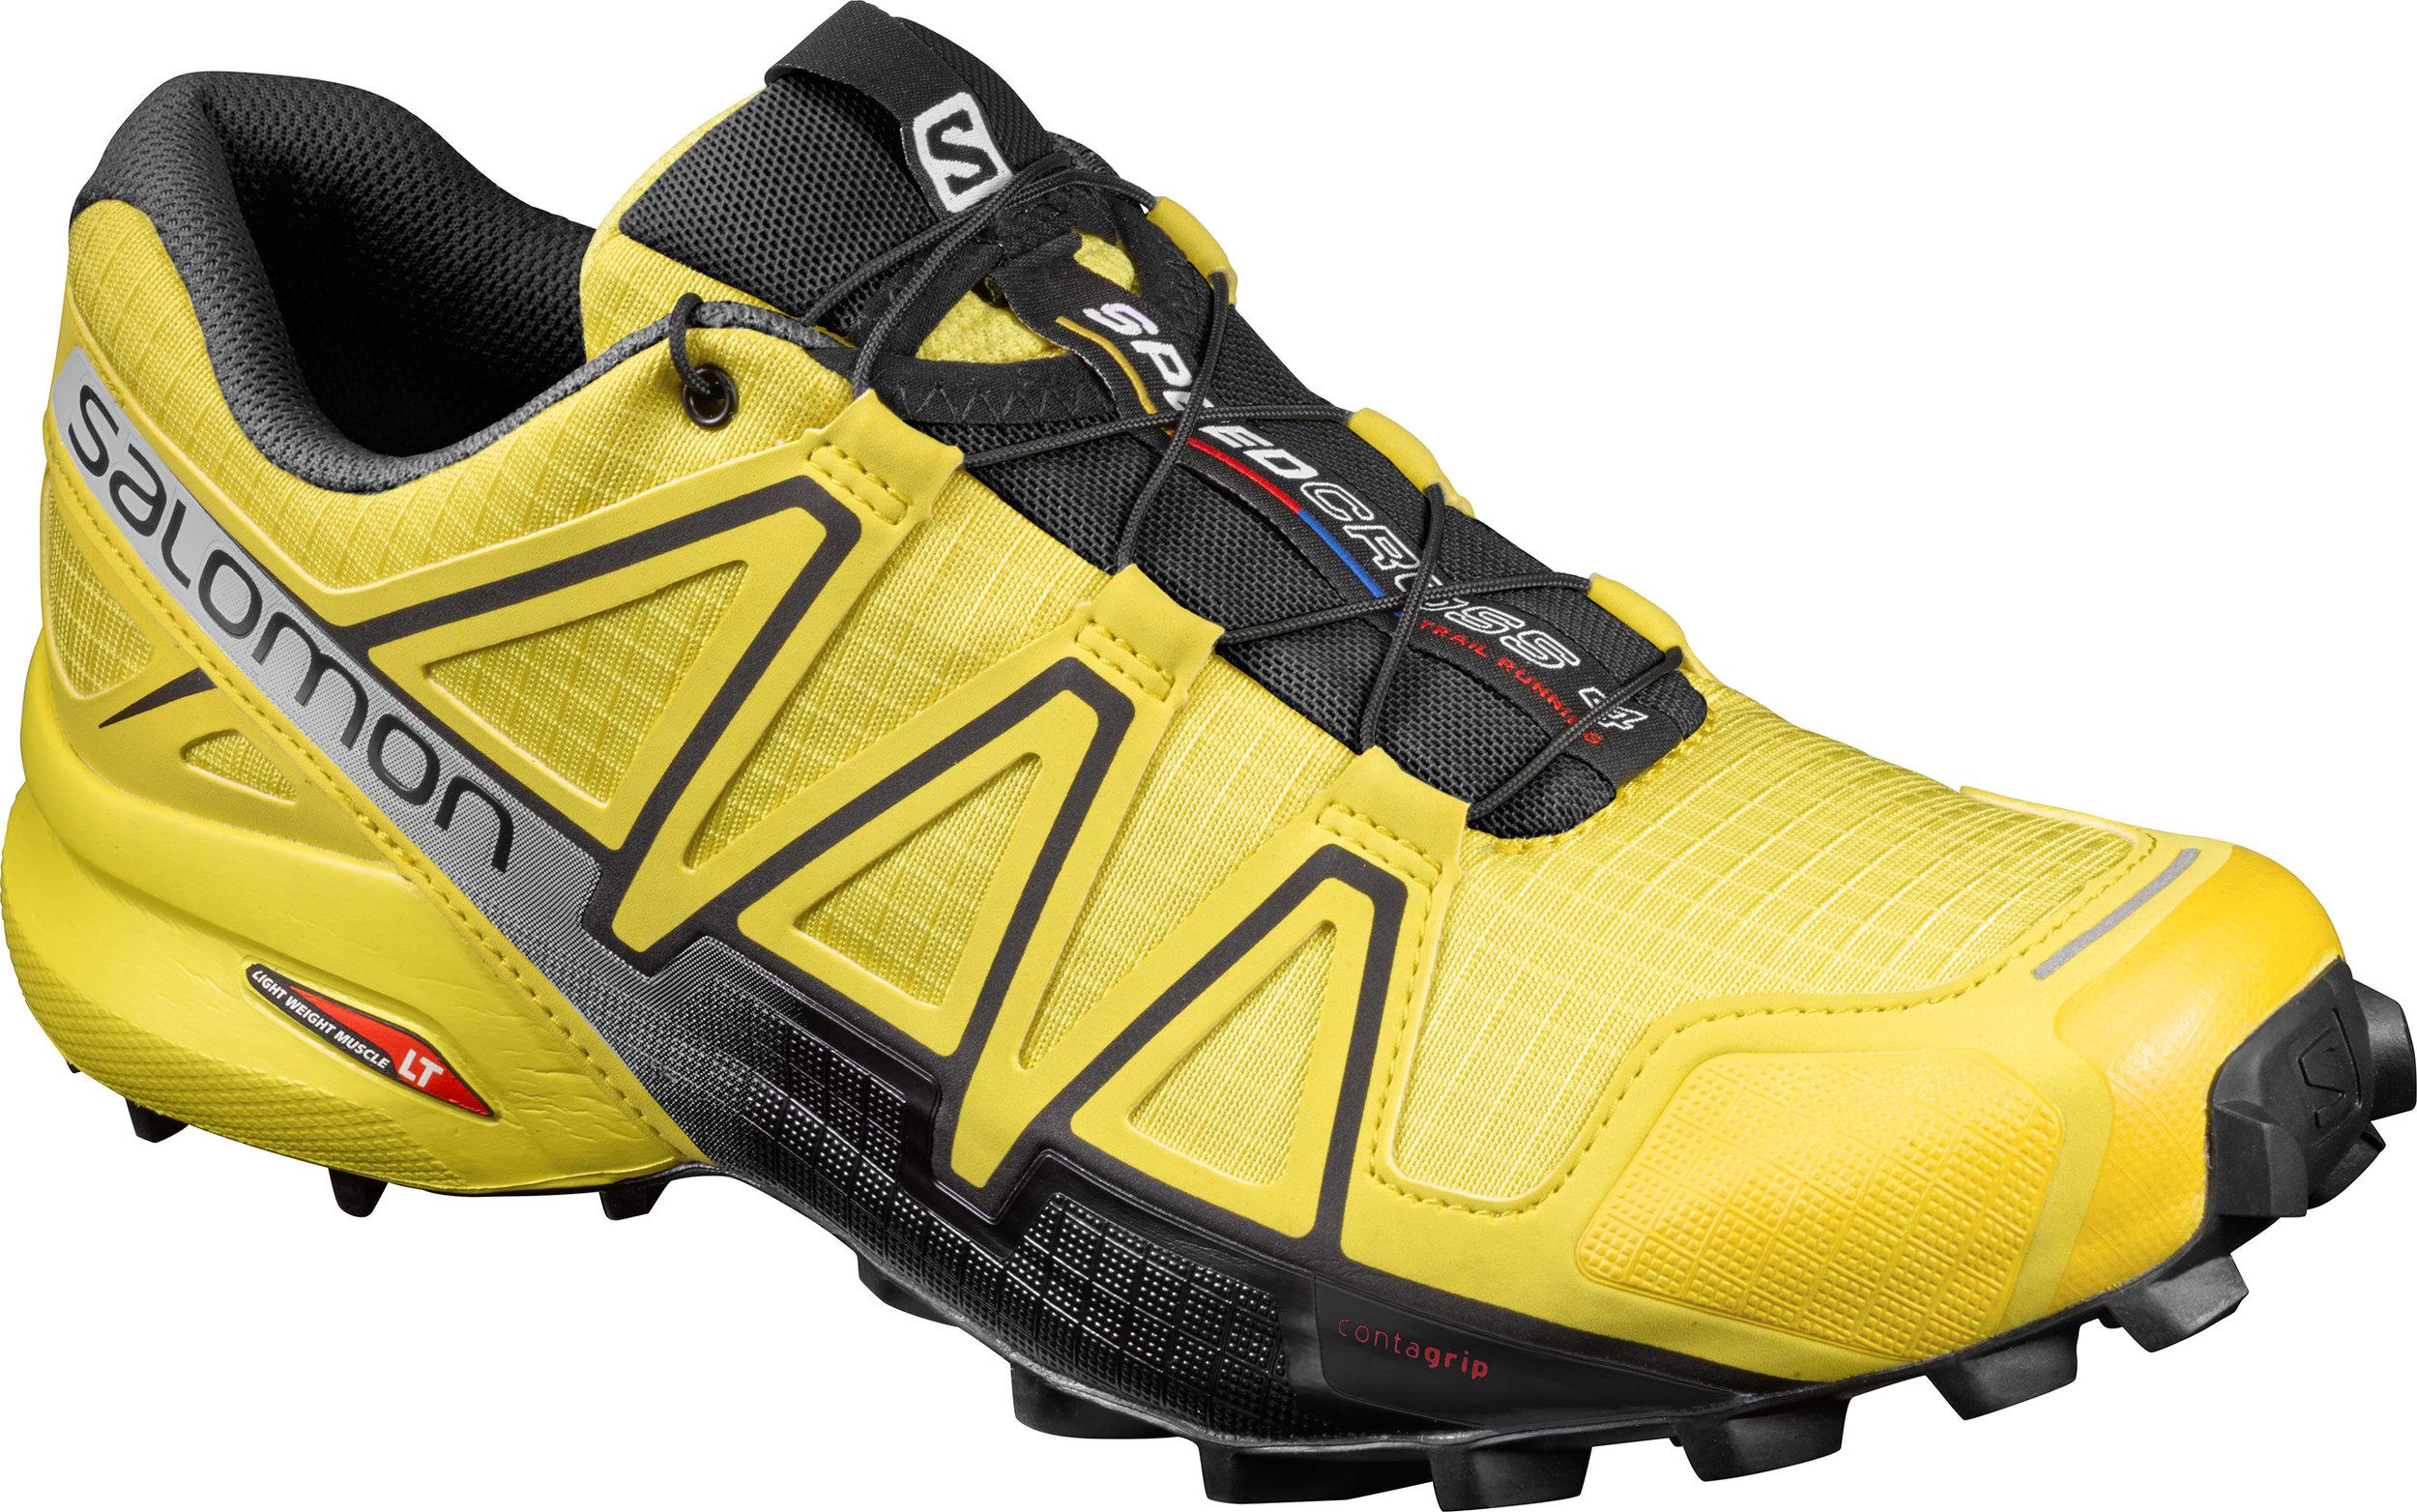 392400_0_M_speedcross-4_blazing-yellow.jpg